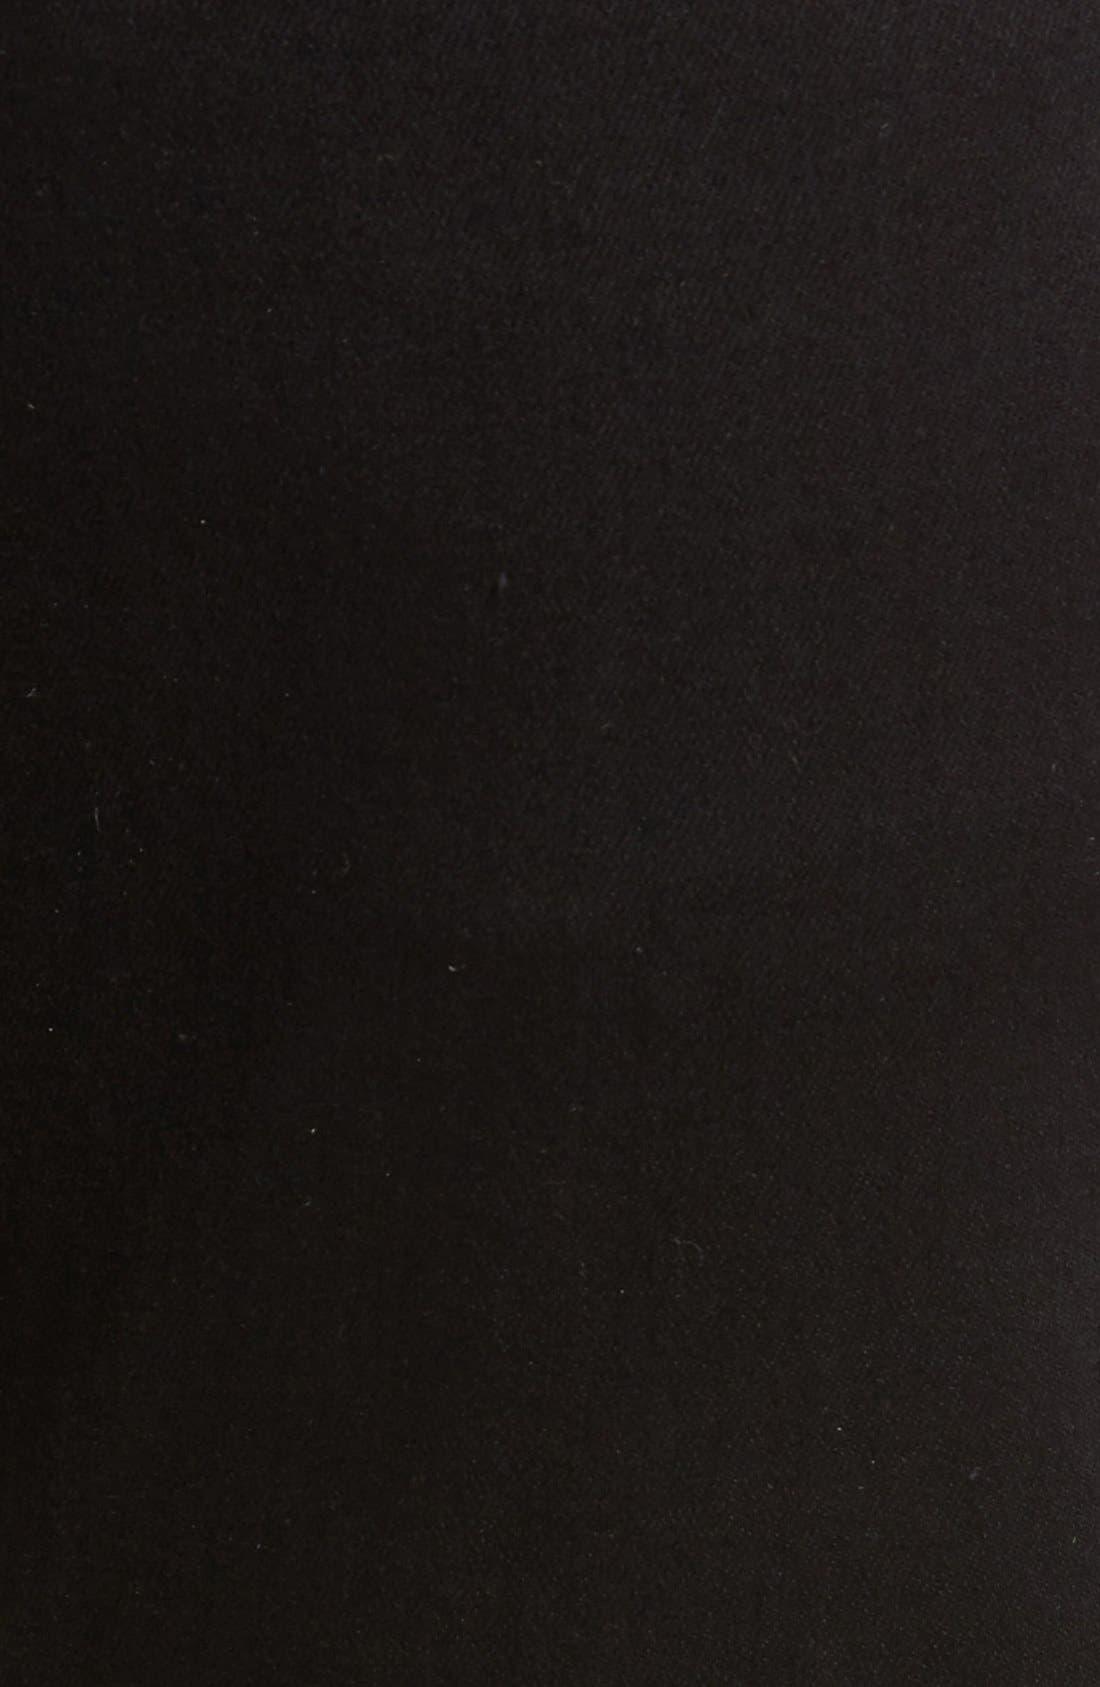 Tyler Slim Fit Jeans,                             Alternate thumbnail 6, color,                             TRIVOR BLACK